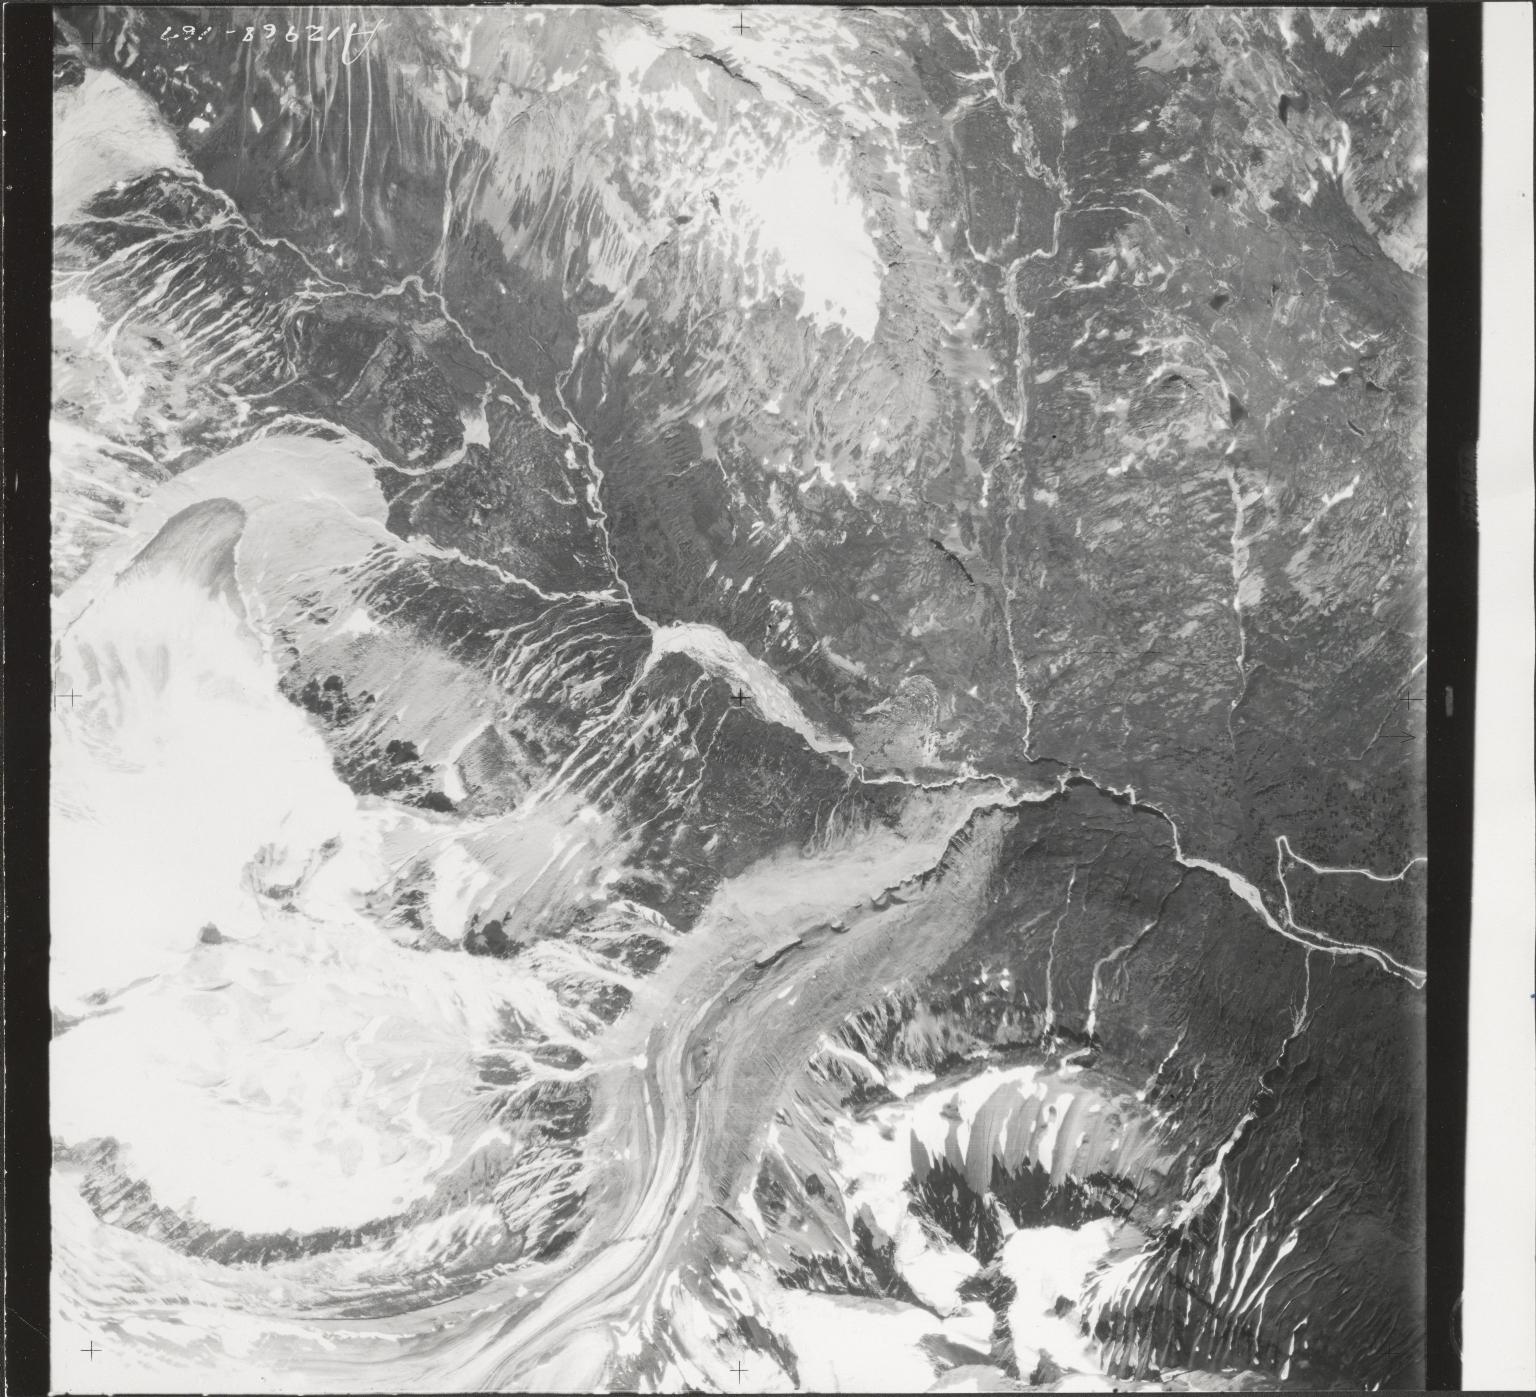 Rainy Hollow Glacier, British Columbia